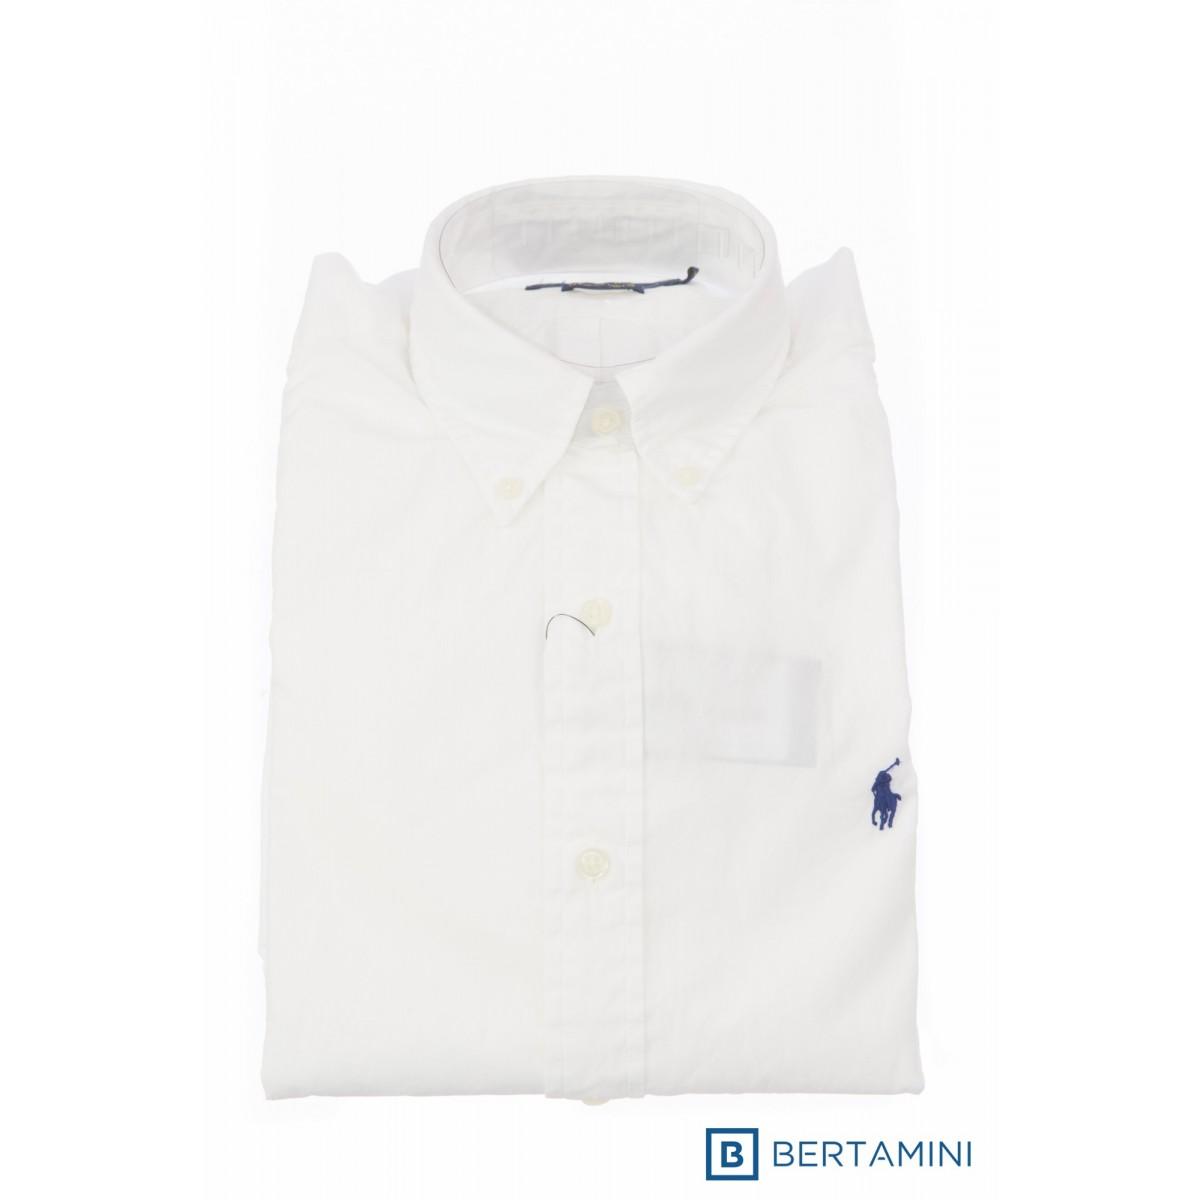 Camicia uomo Ralph lauren - A04w4c01b5c01